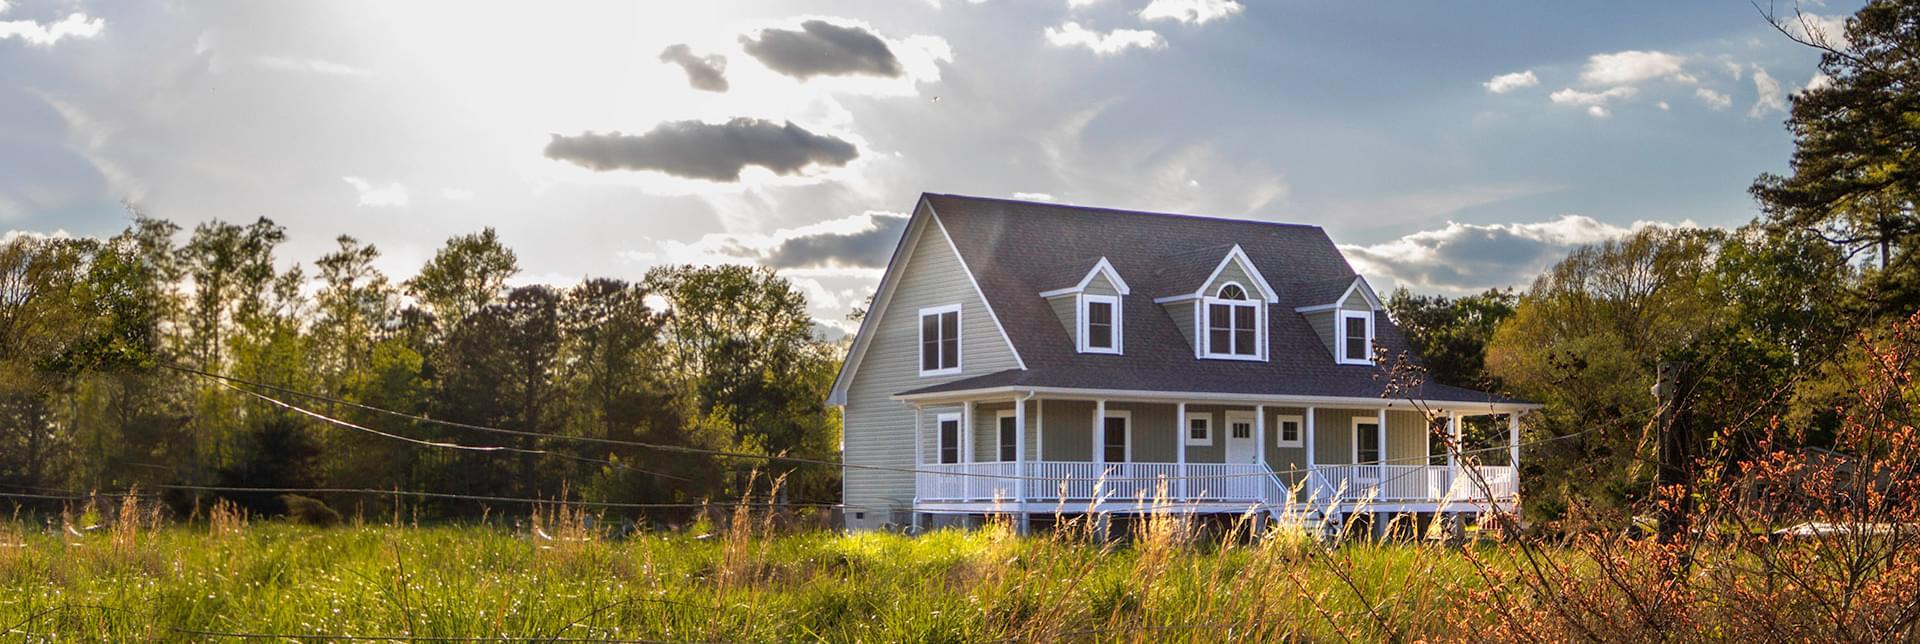 New Homes in Charlotte County VA